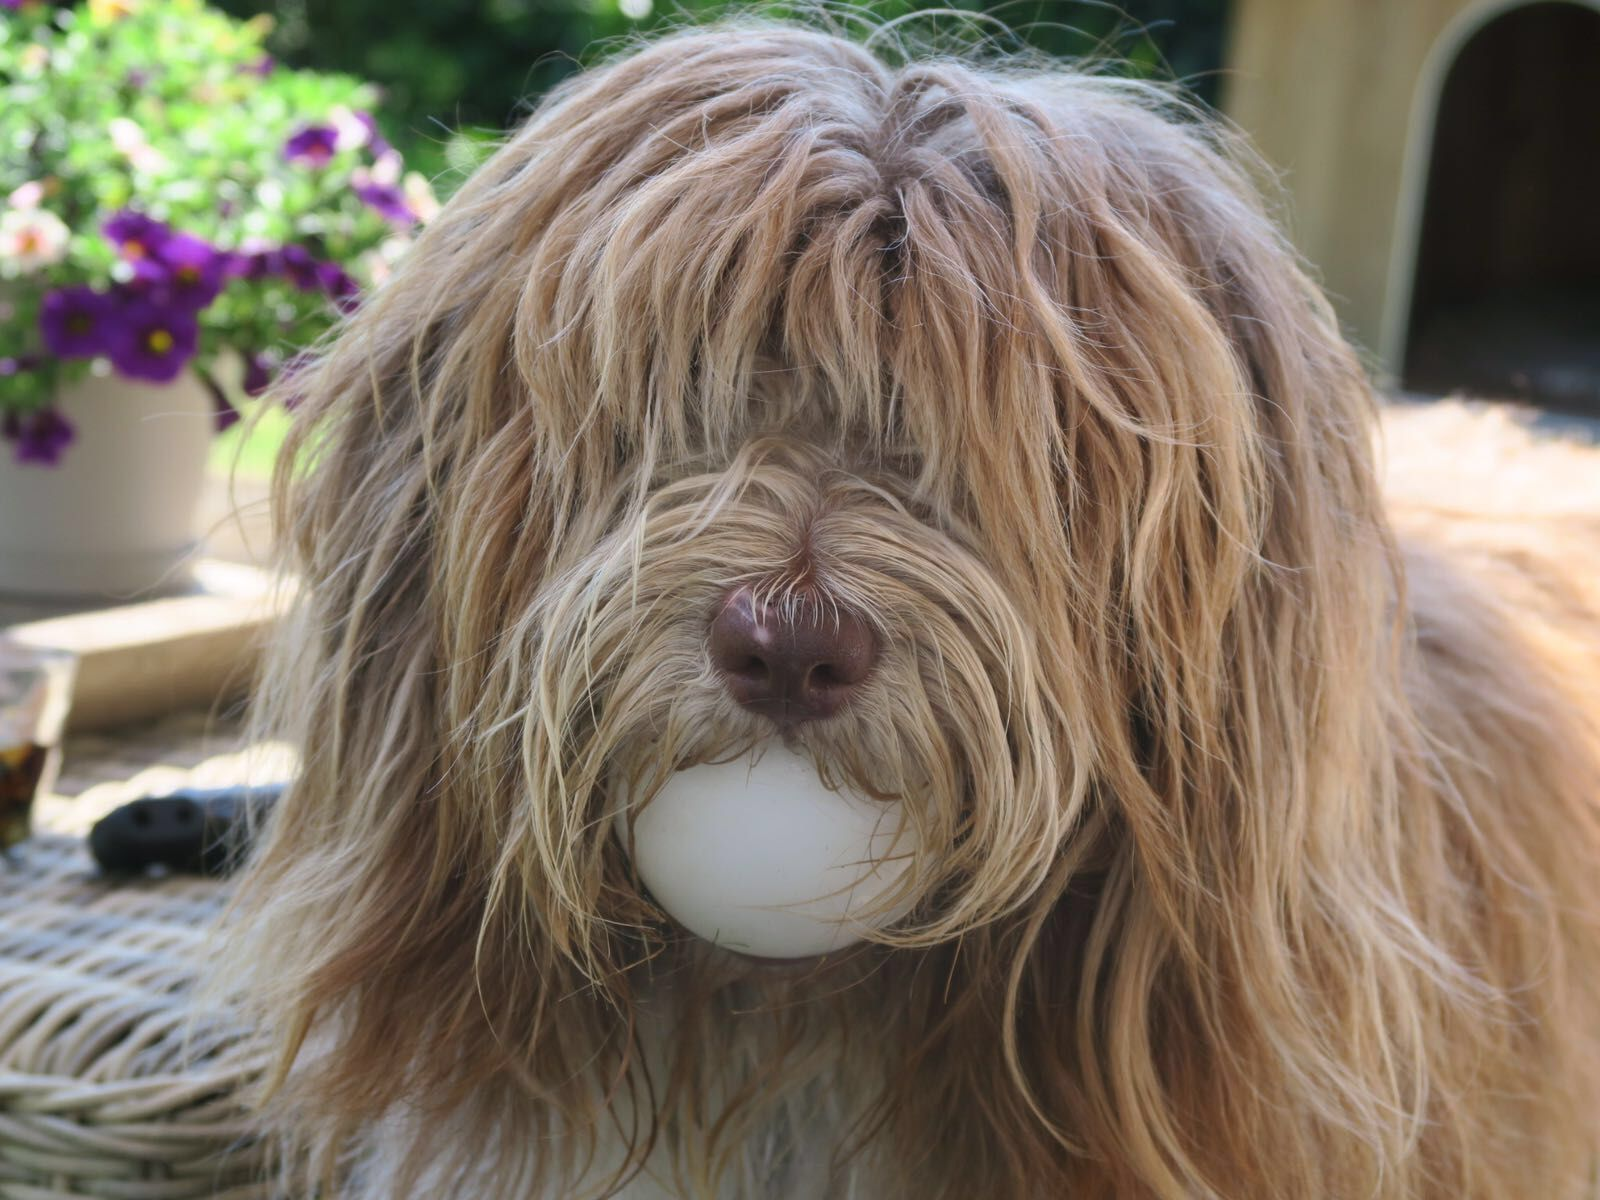 Dutch Sheepdog // Schapendoes // James of The Gentle Bears